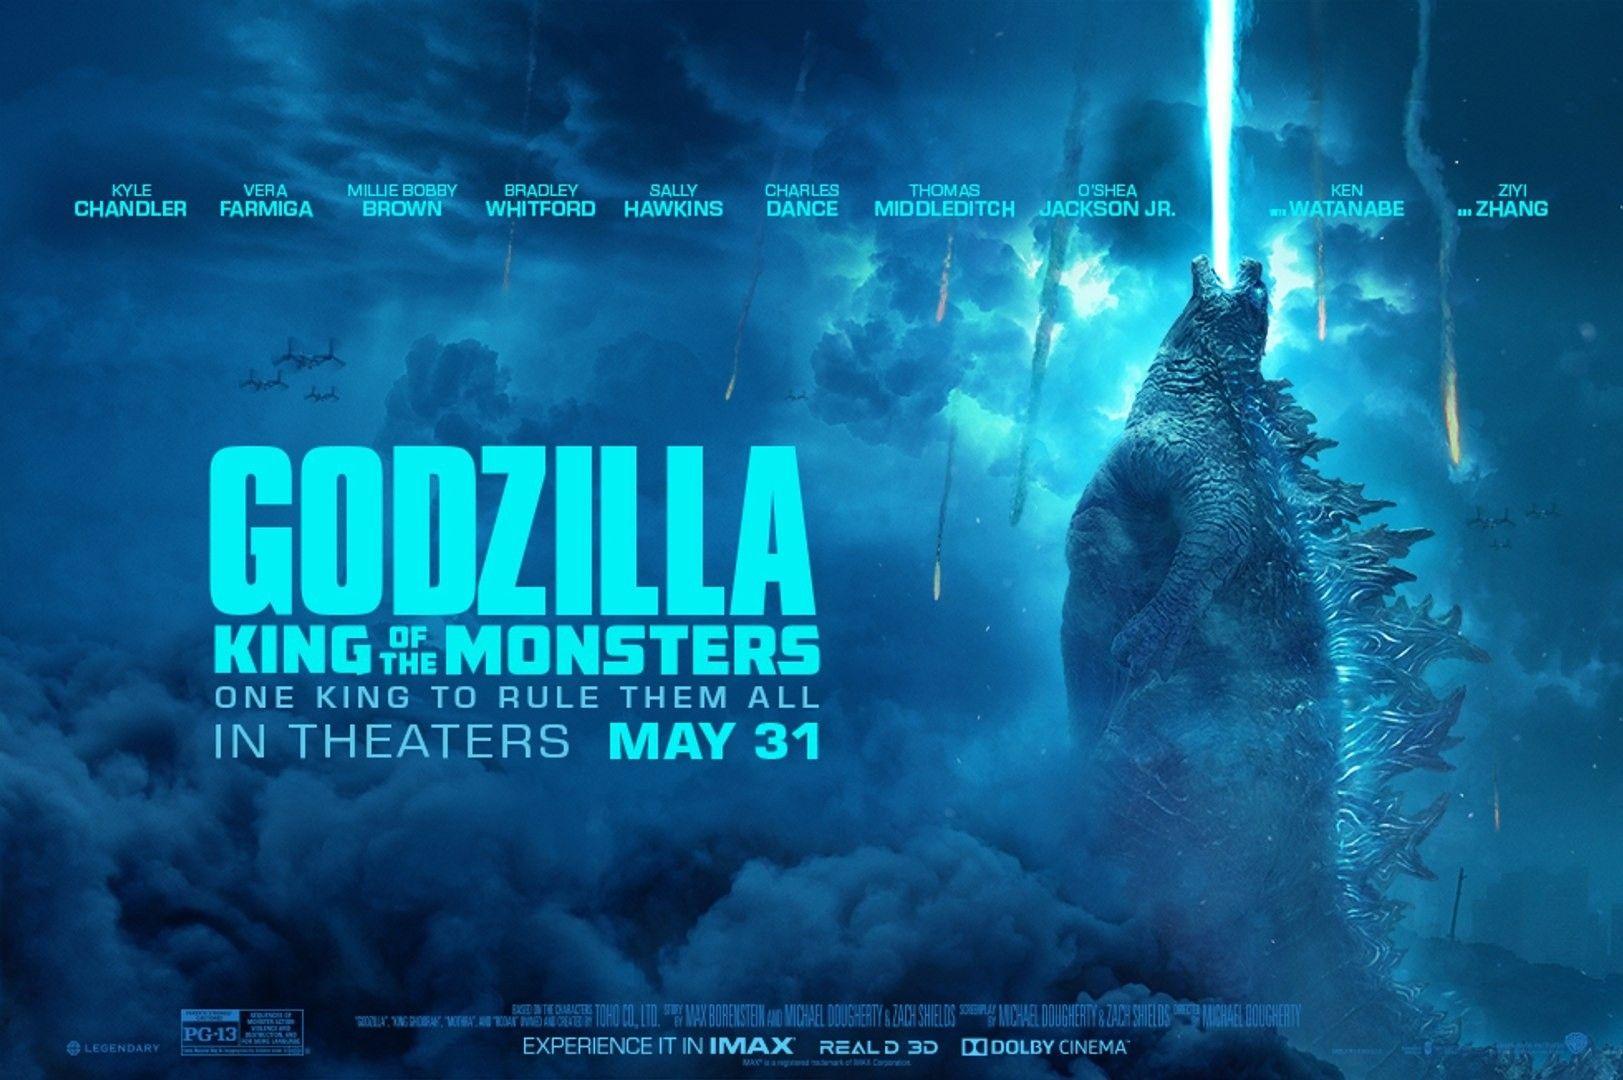 Pin By Theparademon14 On Monsterverse Godzilla The Last Samurai Legendary Pictures